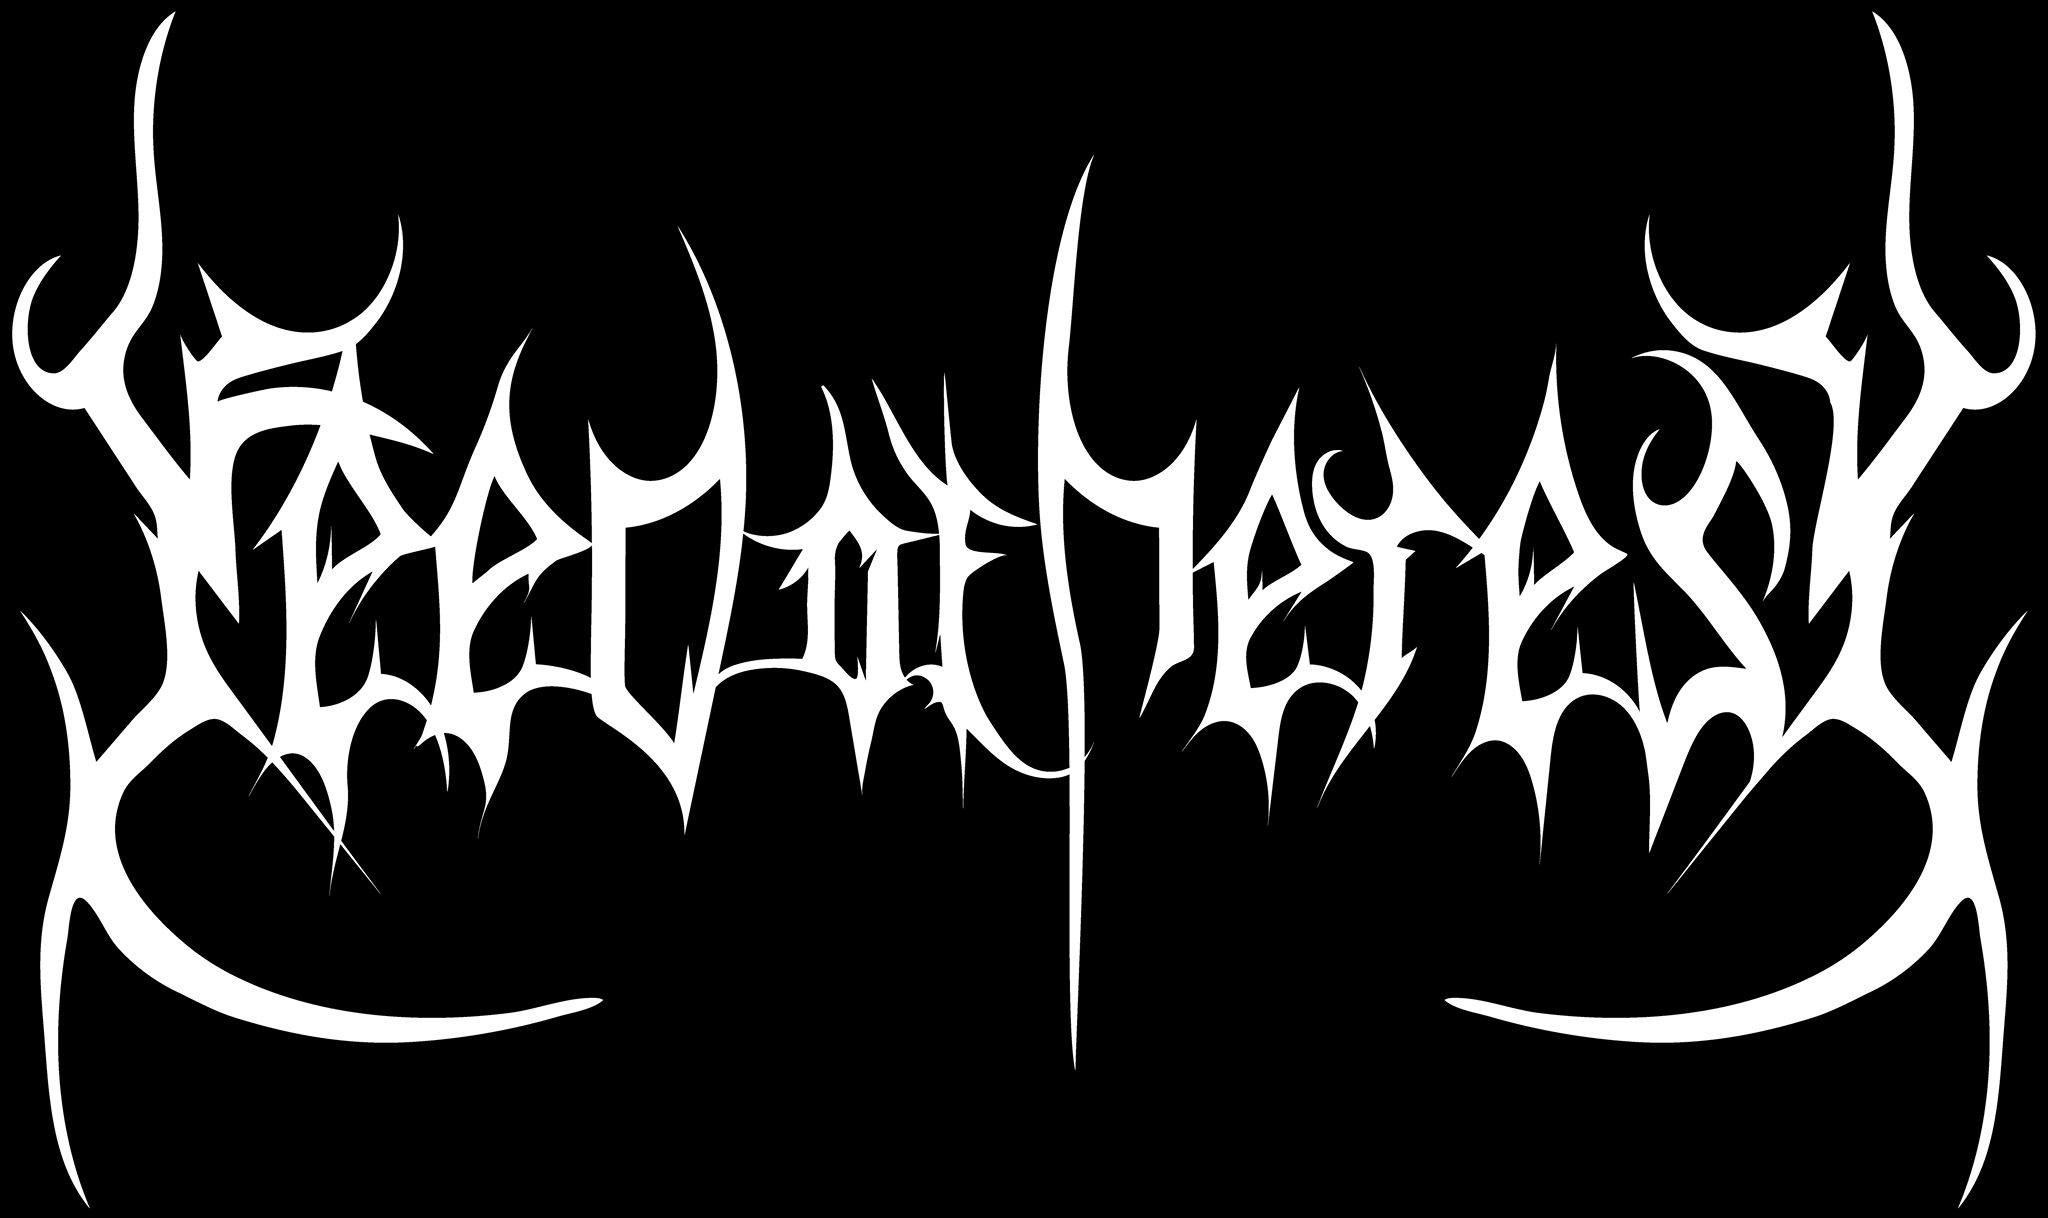 Seed of Heresy (DK)